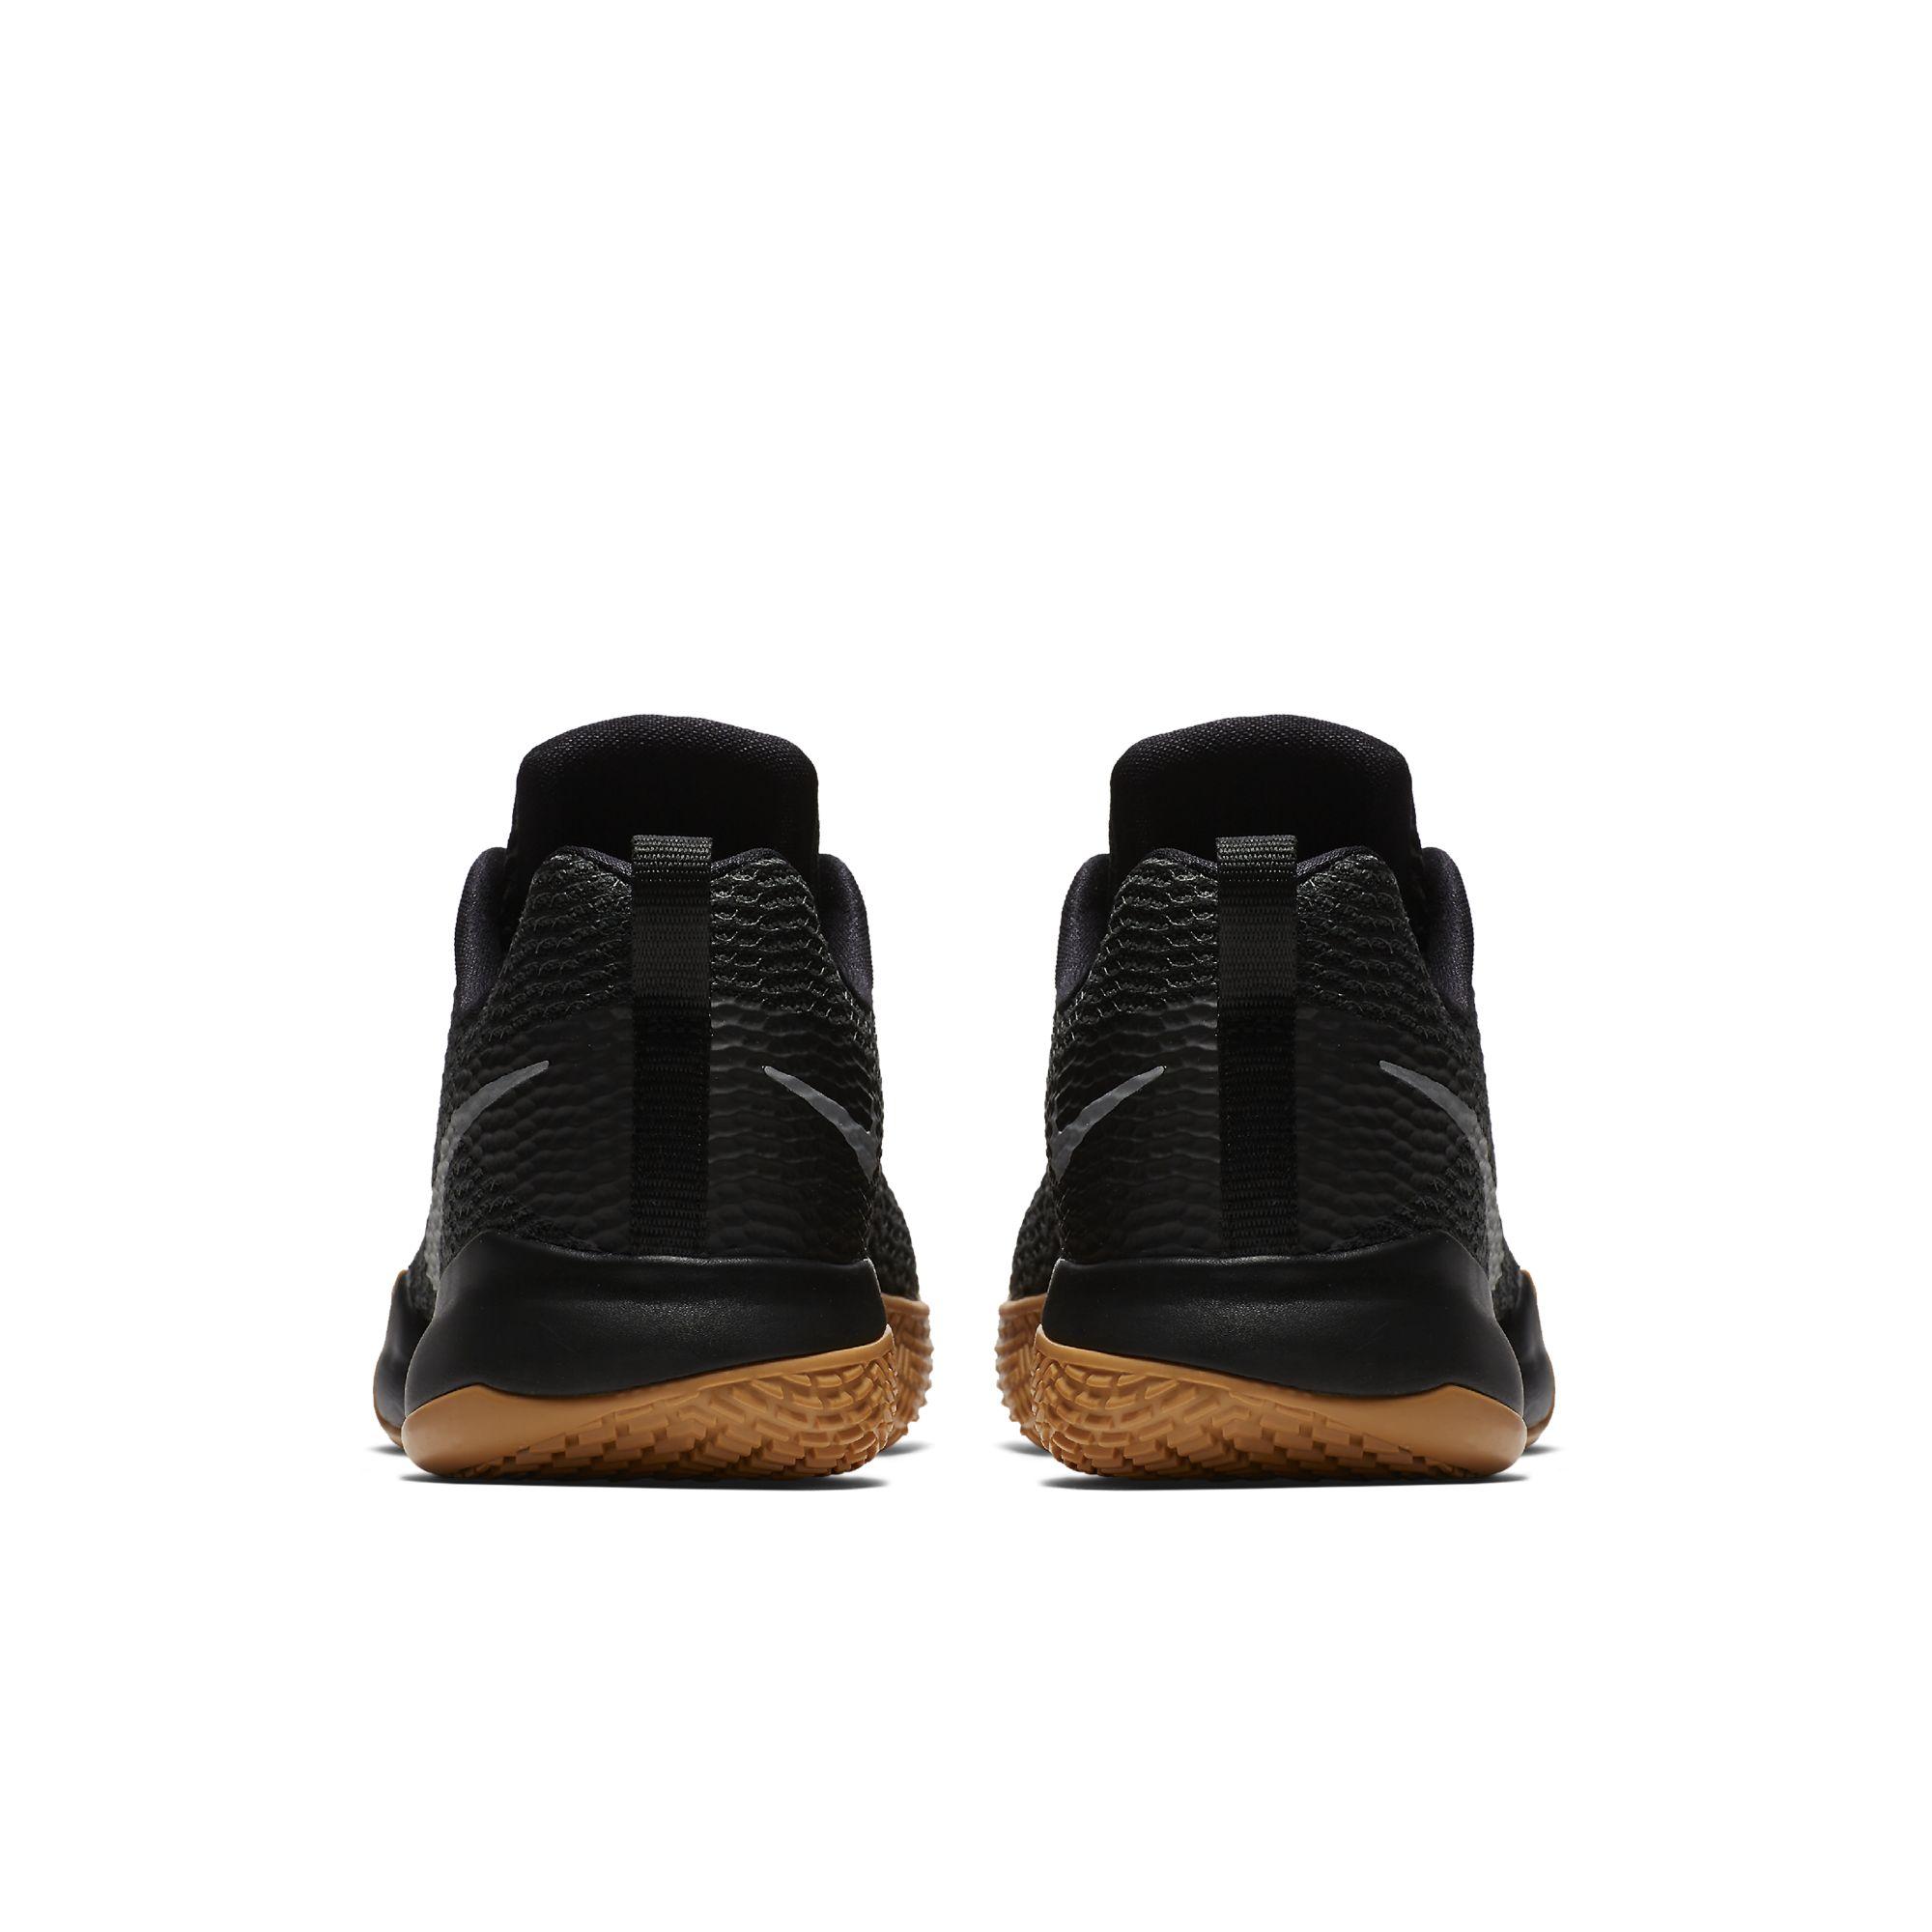 241c8f261373 Nike-Zoom-Live-2-Black-Gum-4 - WearTesters